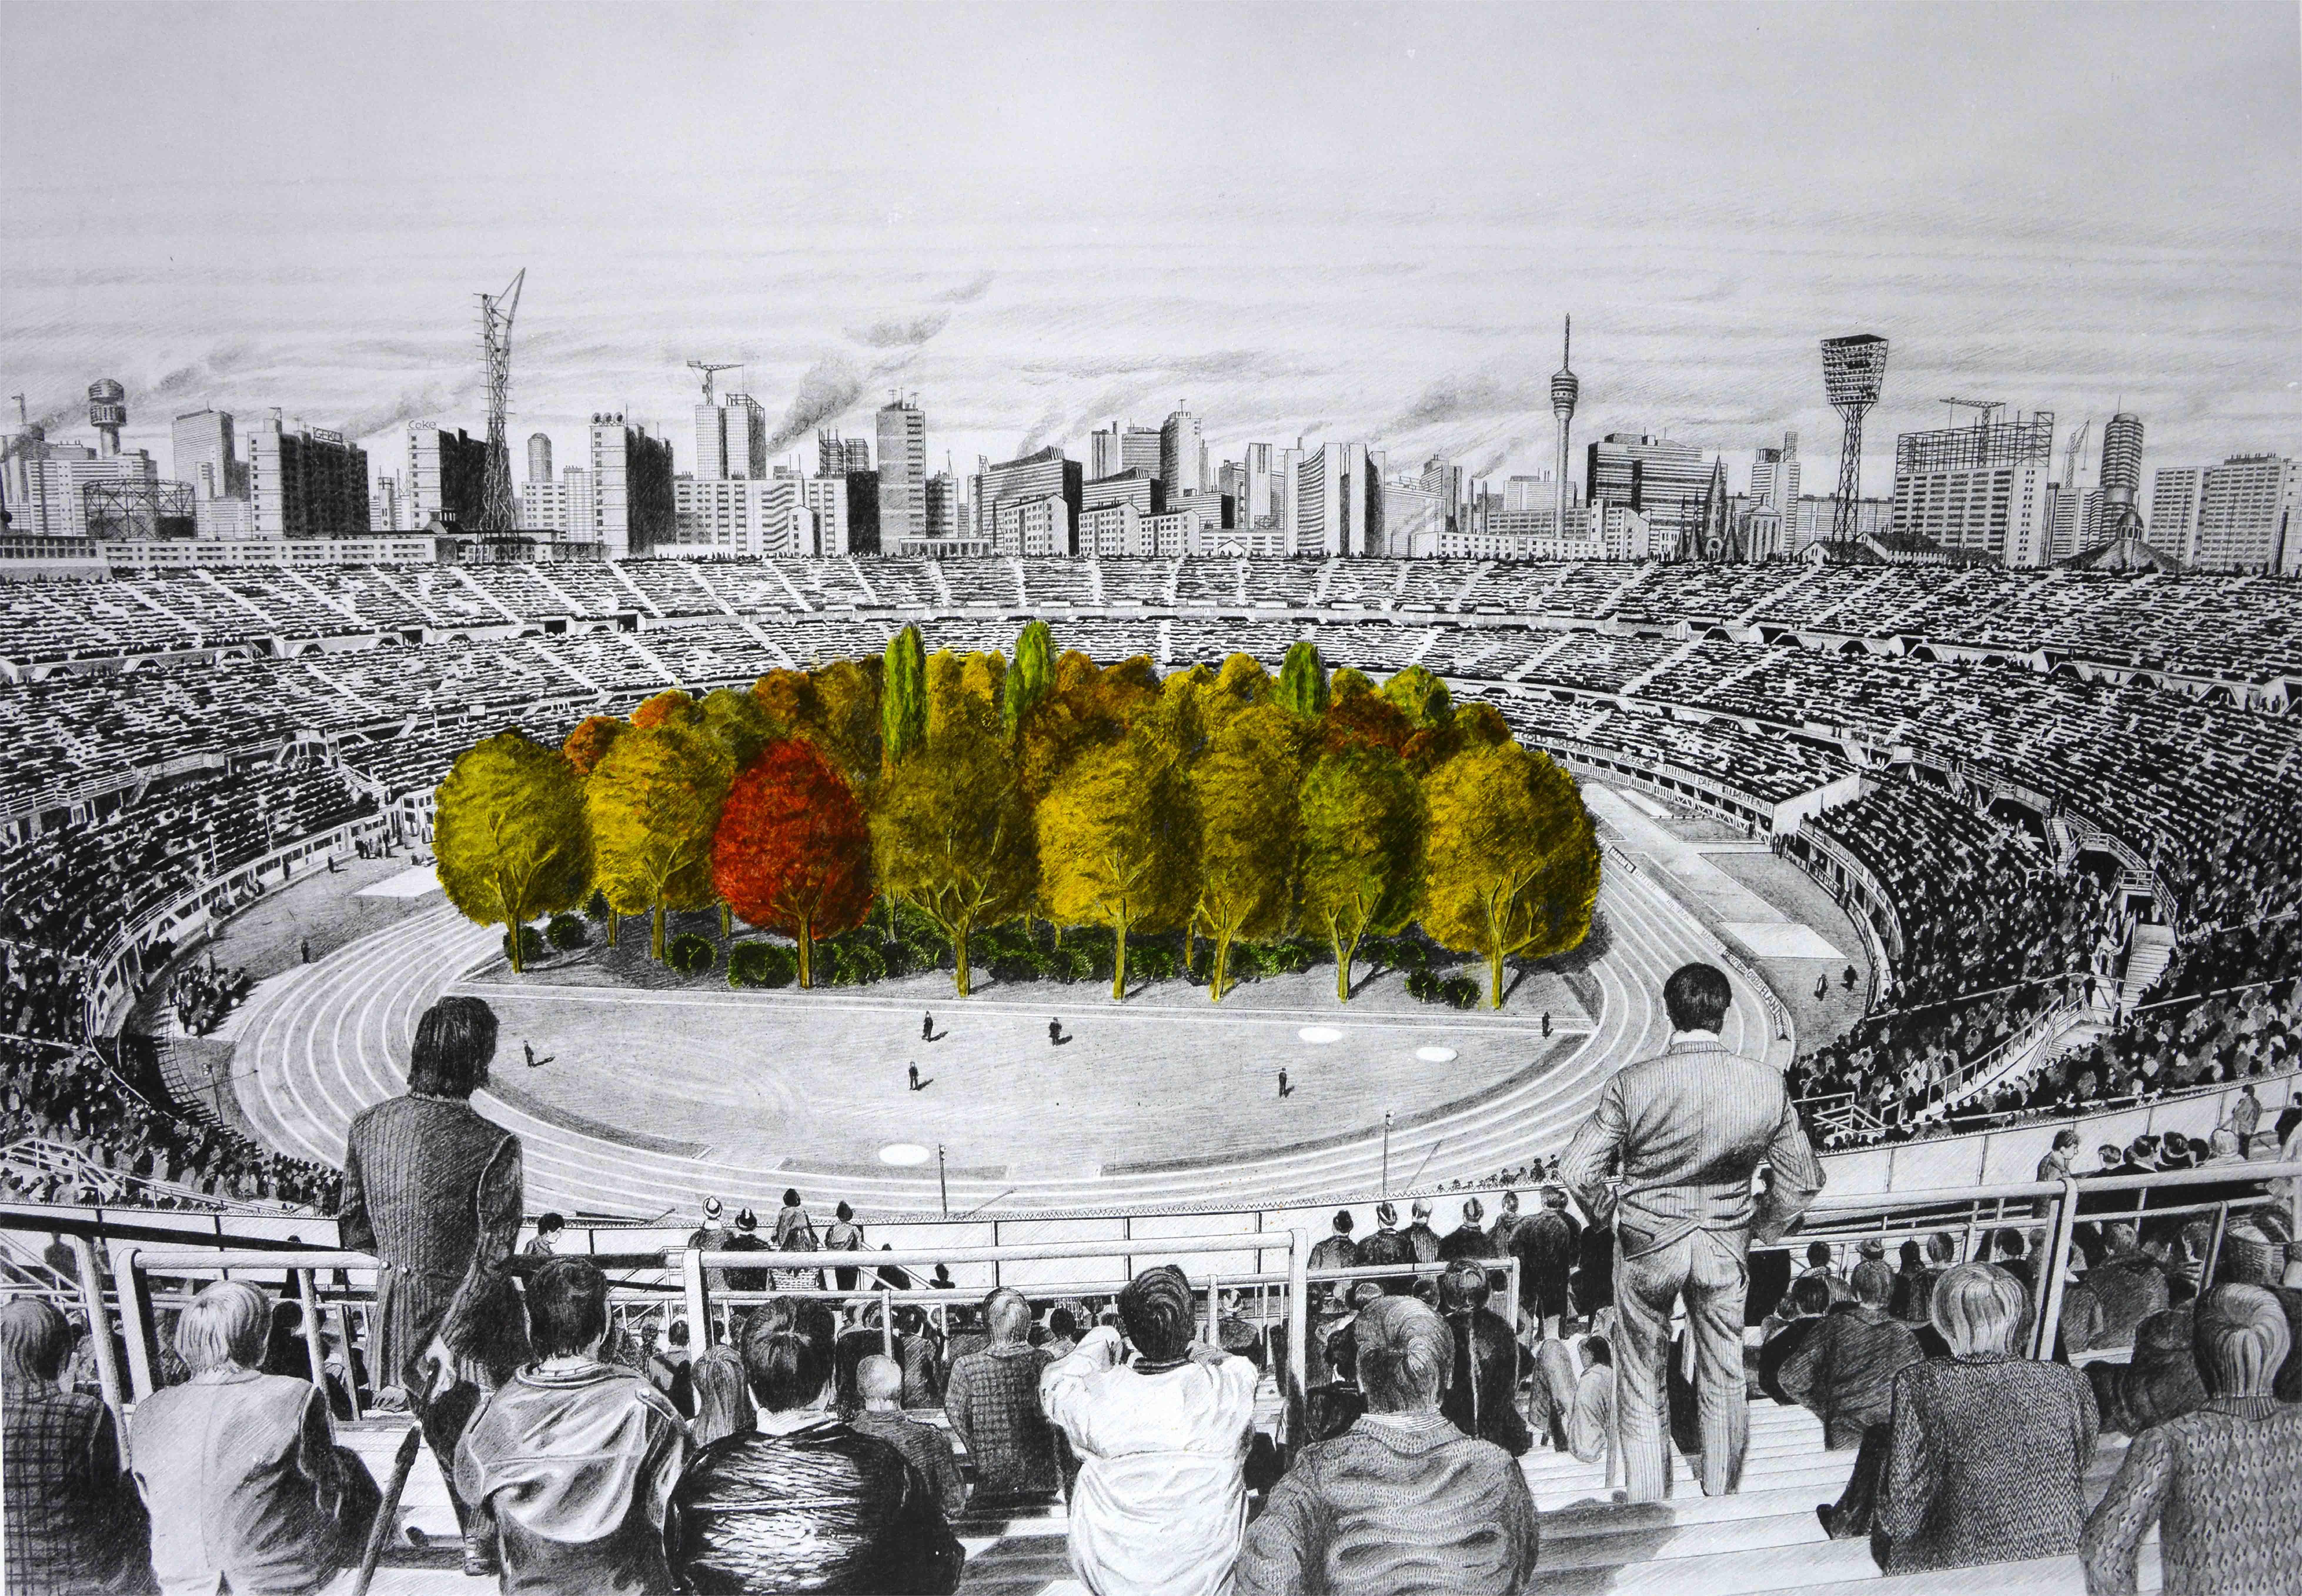 Egy svájci művész erdővé változtatja a klagenfurti stadiont